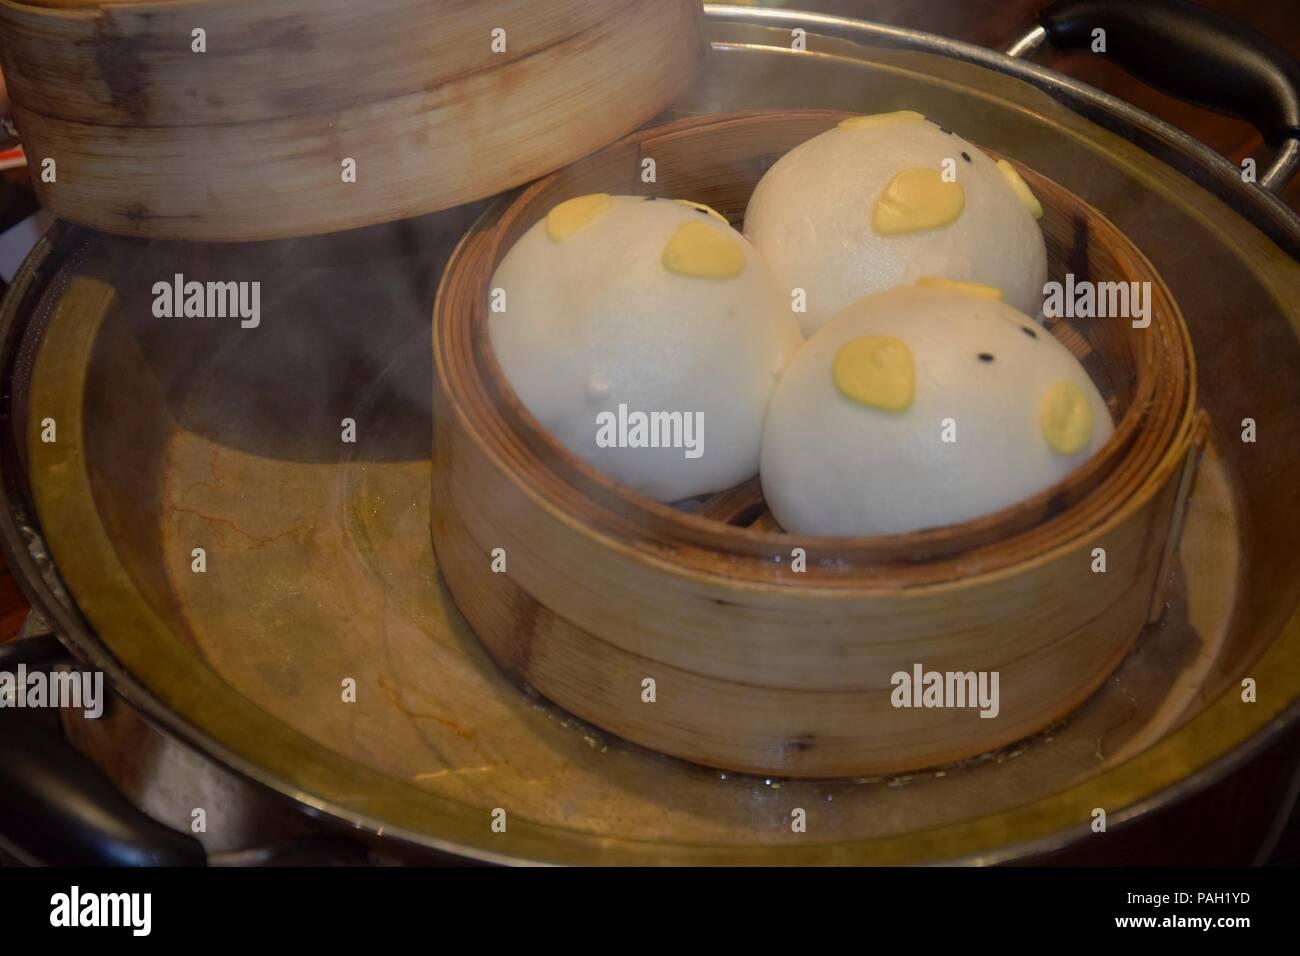 Cantonese Steamed Fish Stockfotos & Cantonese Steamed Fish Bilder ...